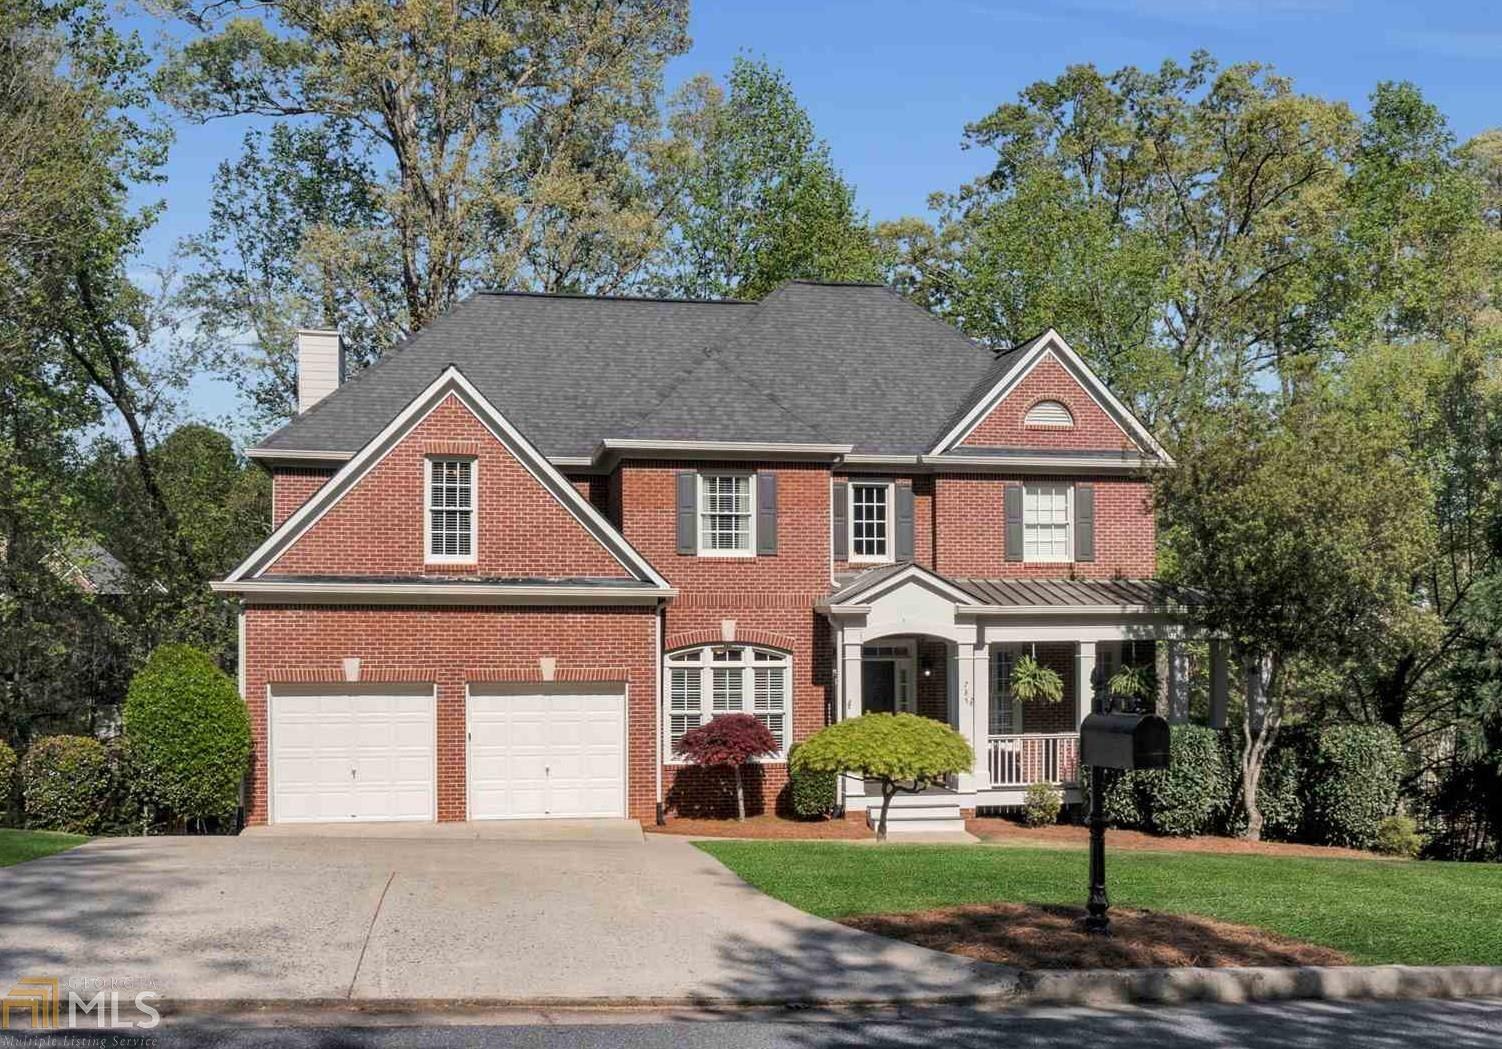 785 Glenleigh Ln, Johns Creek, GA 30097 - MLS#: 8960824